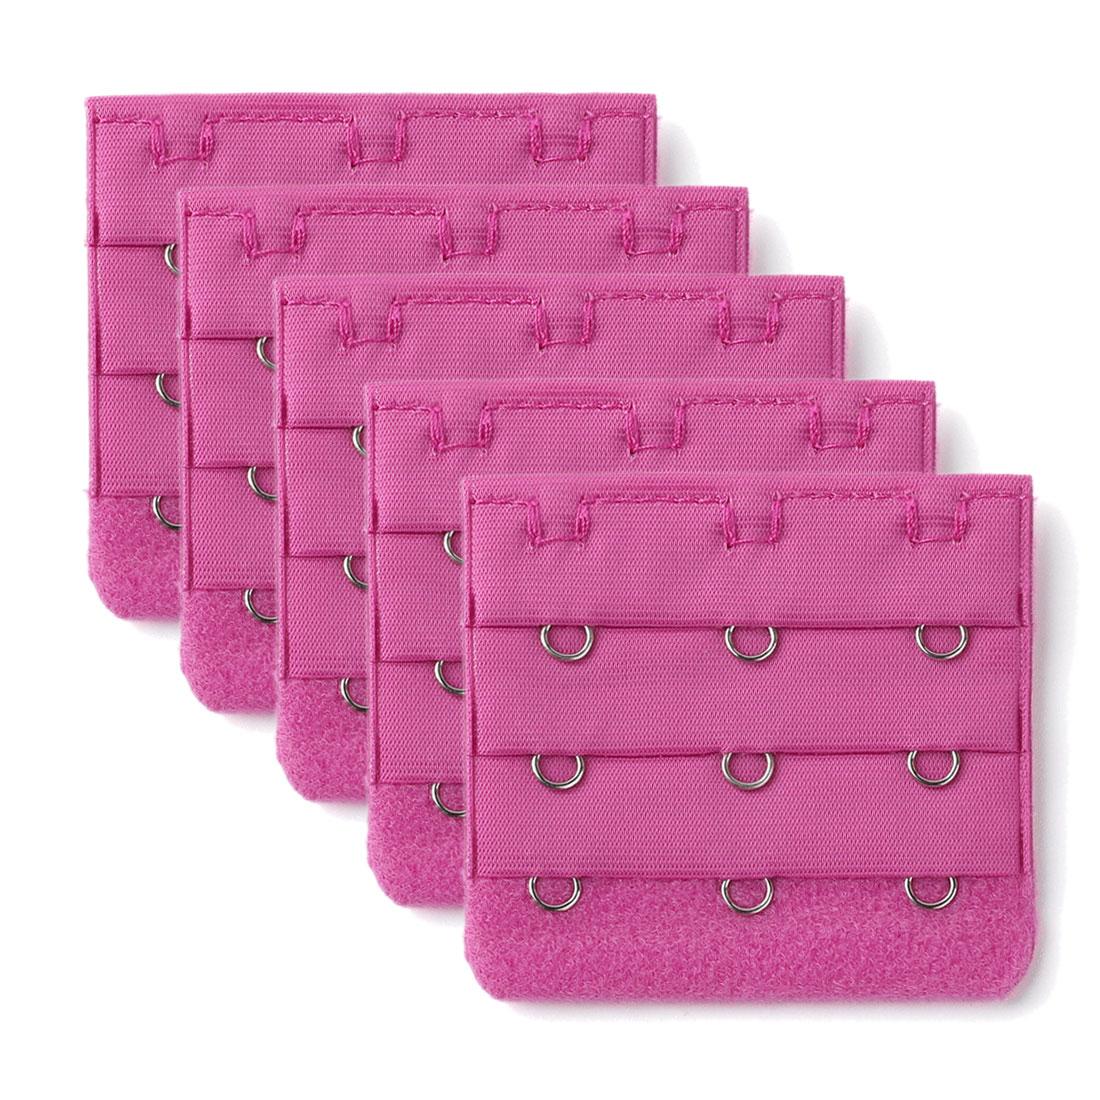 5 Pcs Amaranth Pink Bra Extender Extension Strap 3x3 Hooks